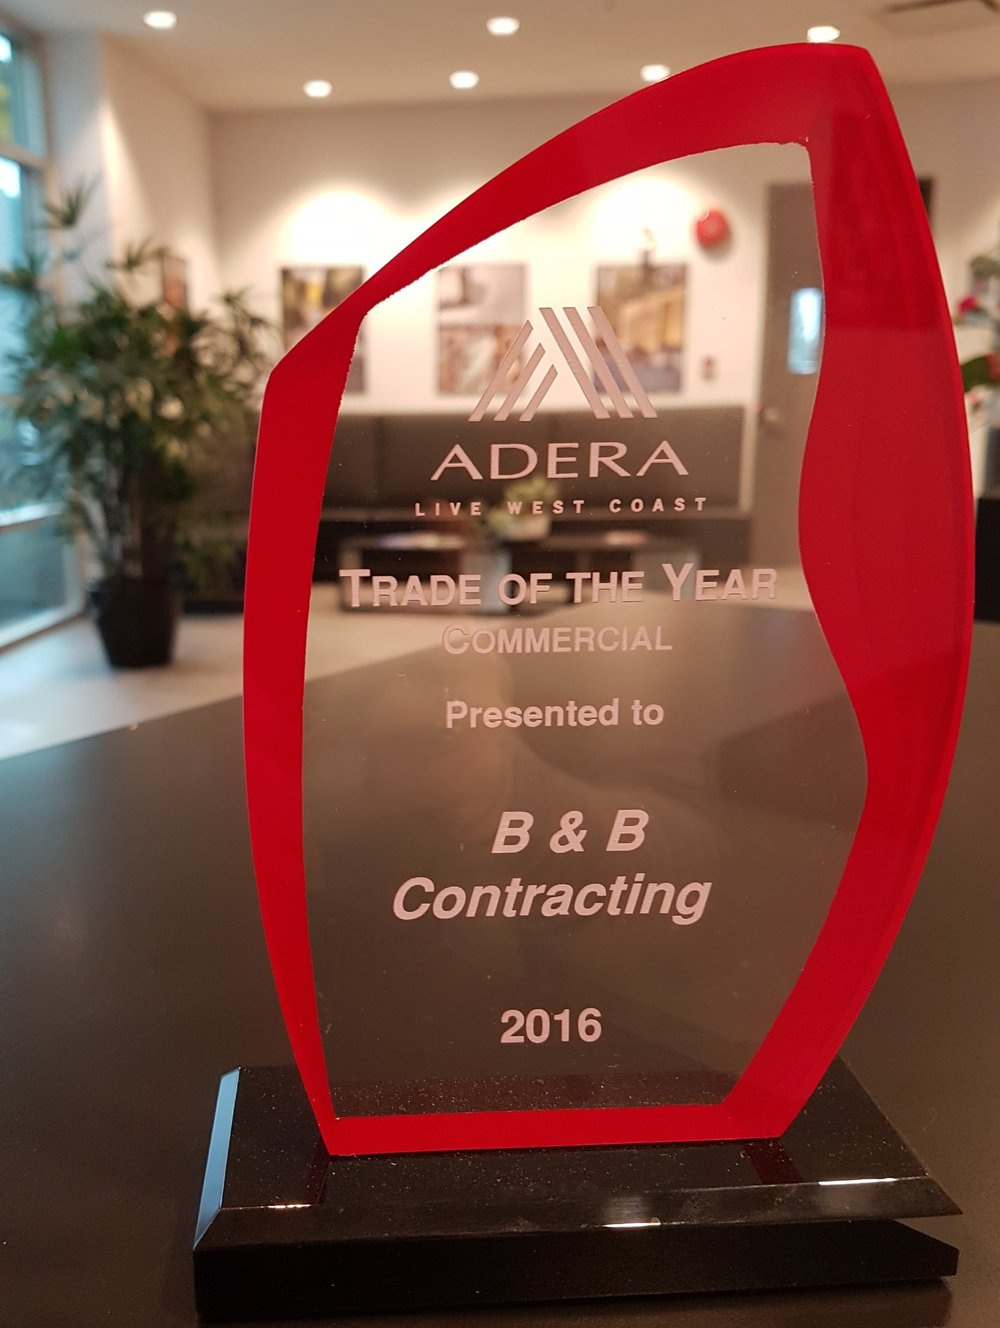 Adera Live West Coast  - B&B Contracting Award.jpg